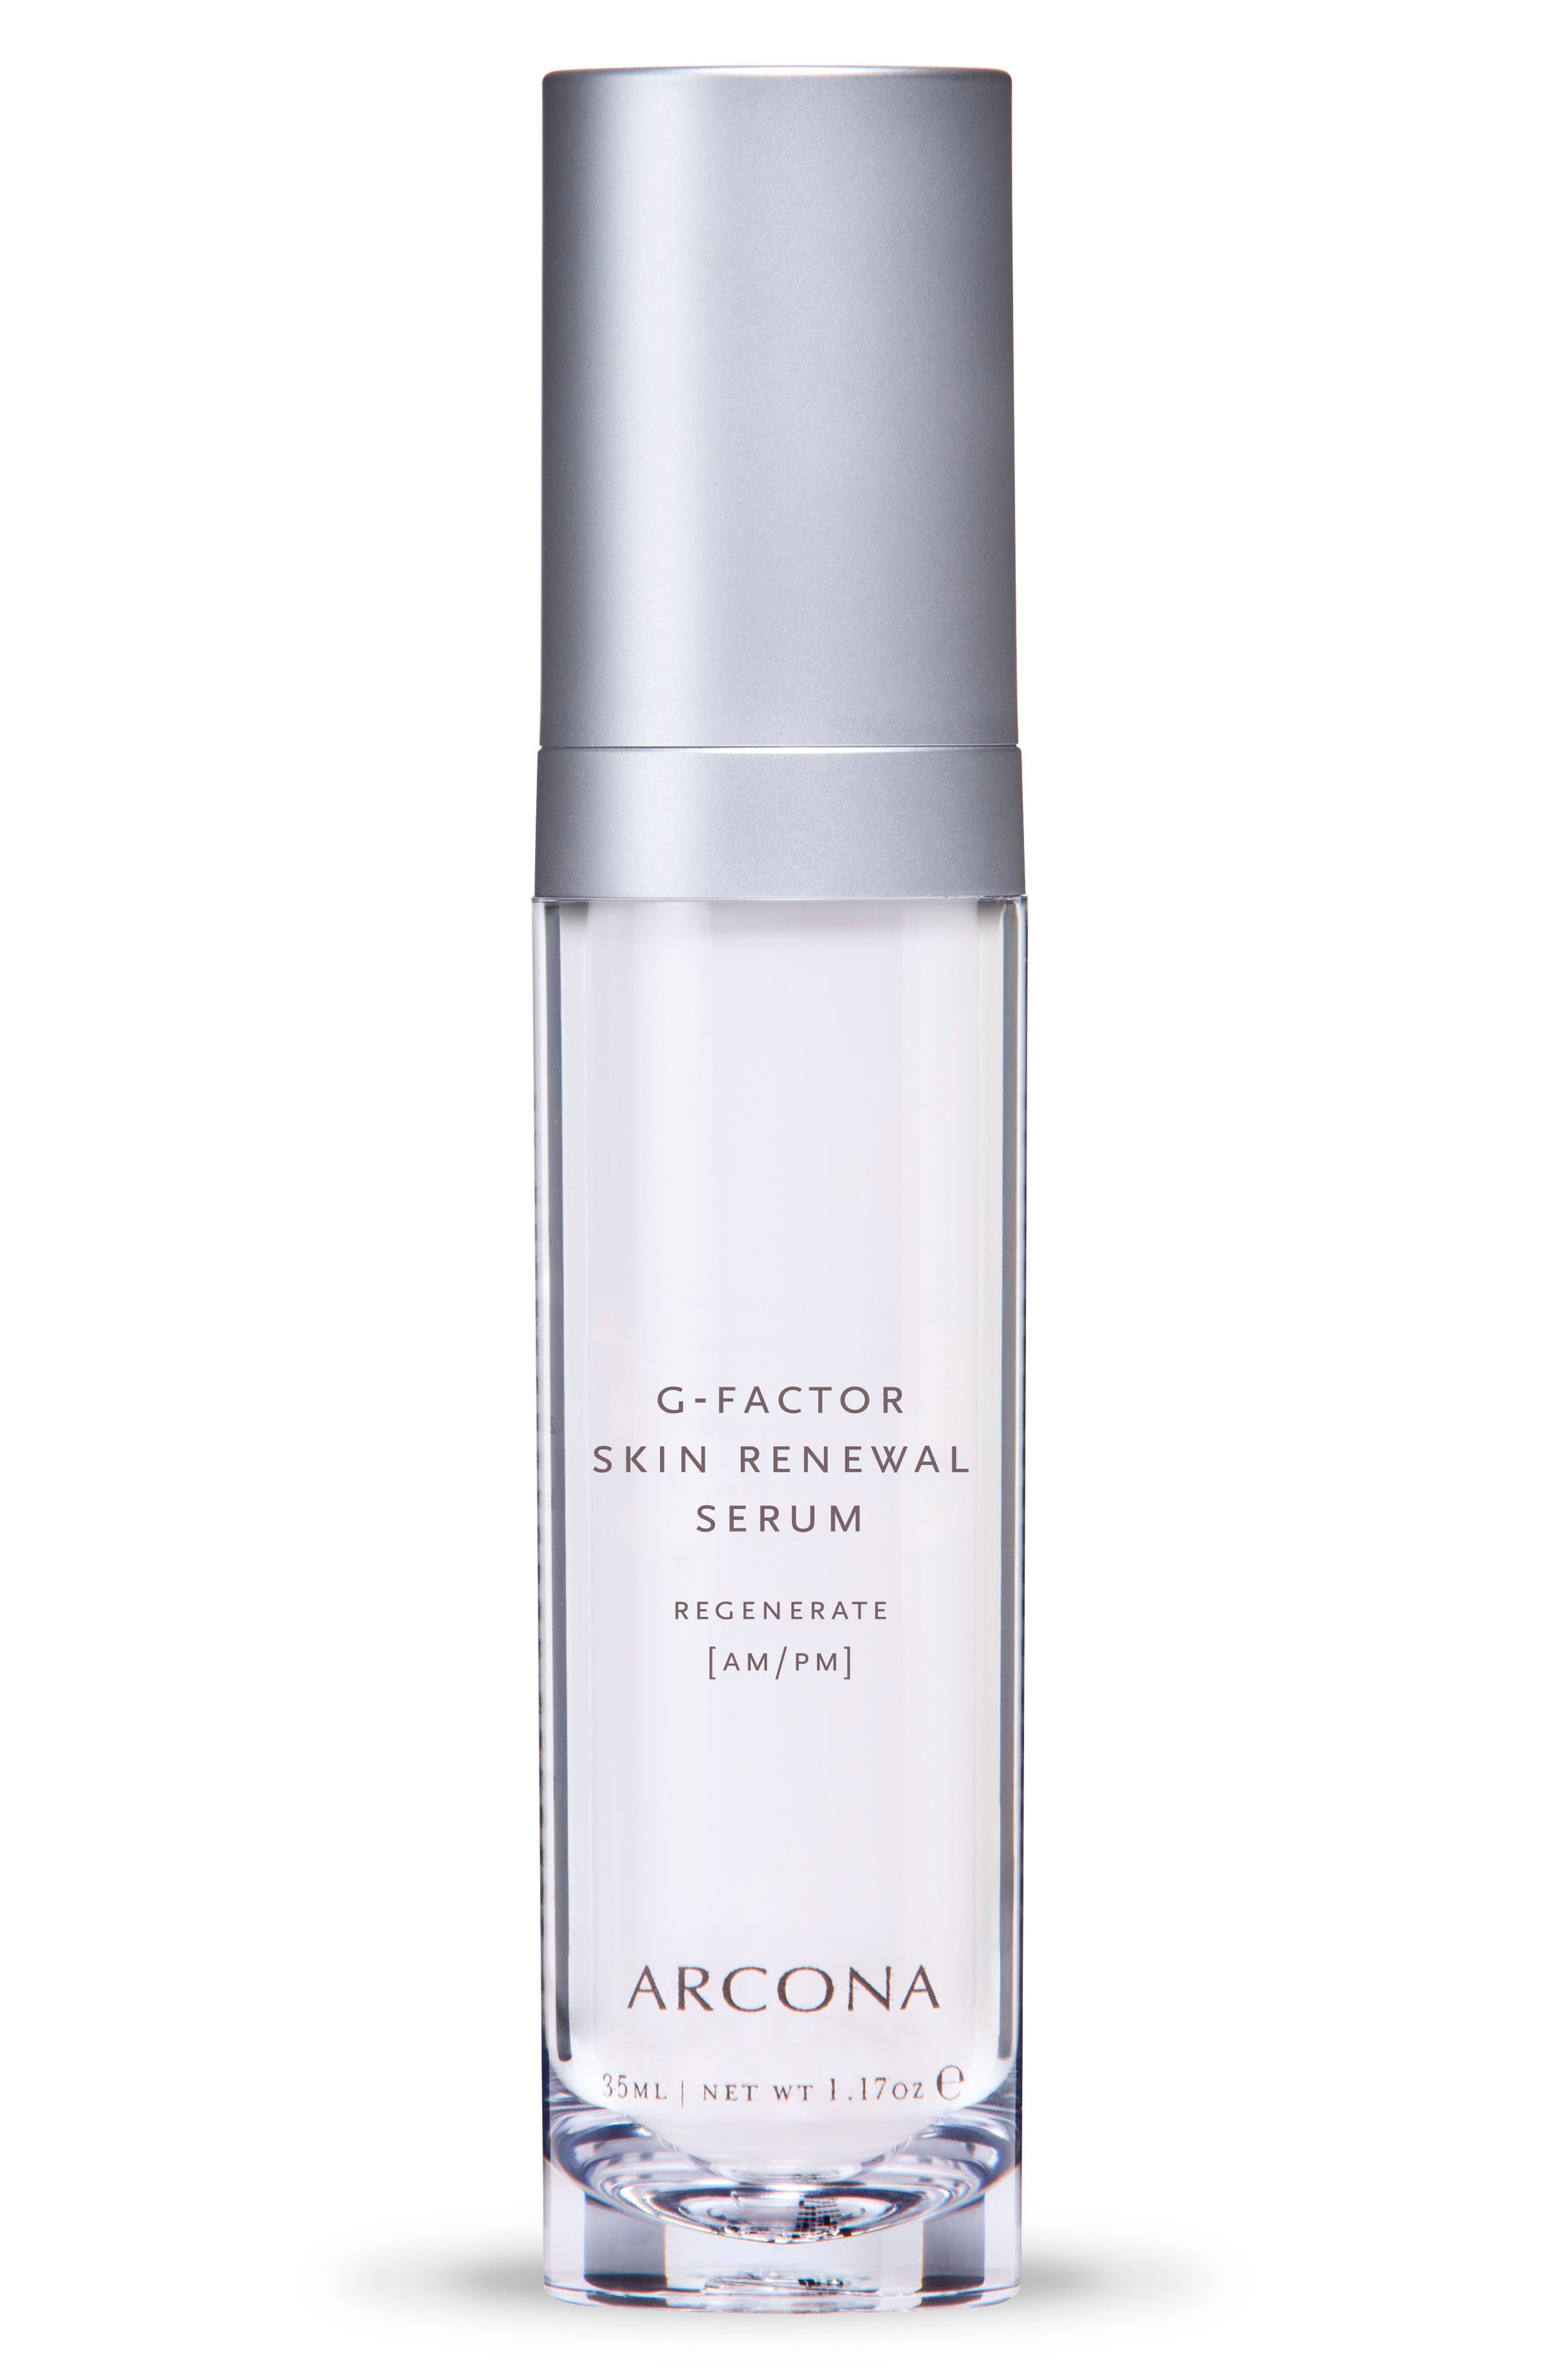 Alternate Image 1 Selected - ARCONA G-Factor Skin Renewal Serum